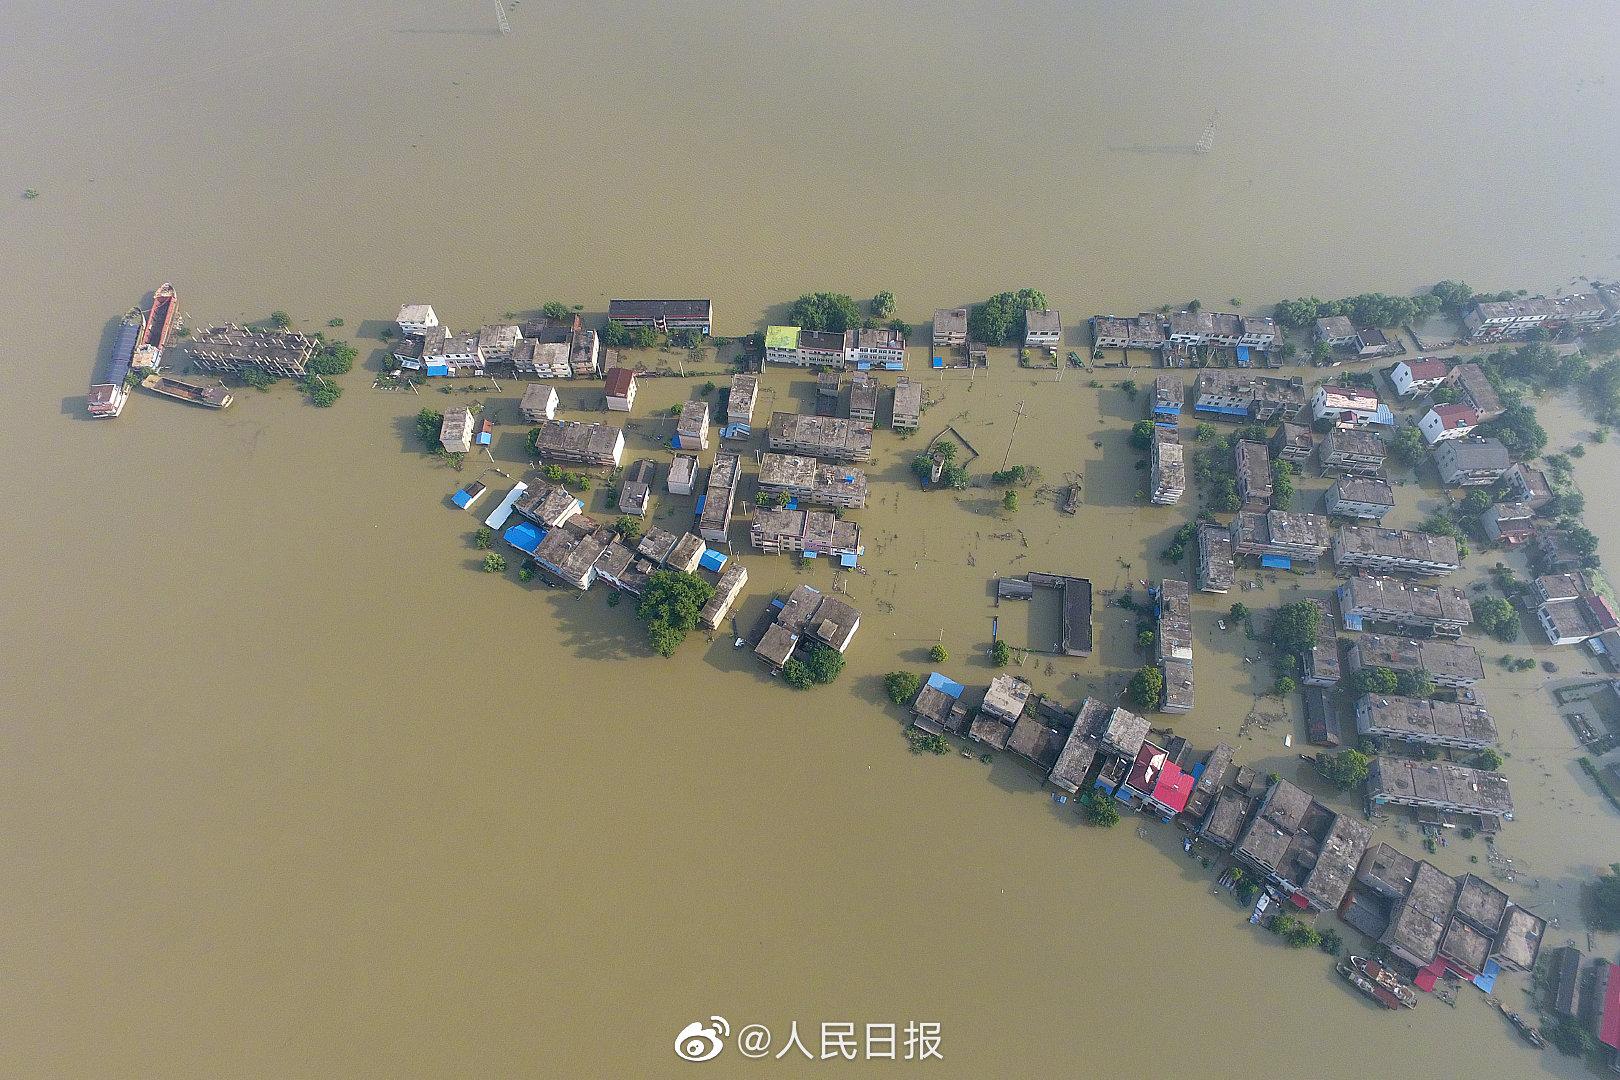 【Jopee元搜索】_35条河湖超警戒水位 安徽启动一级应急响应